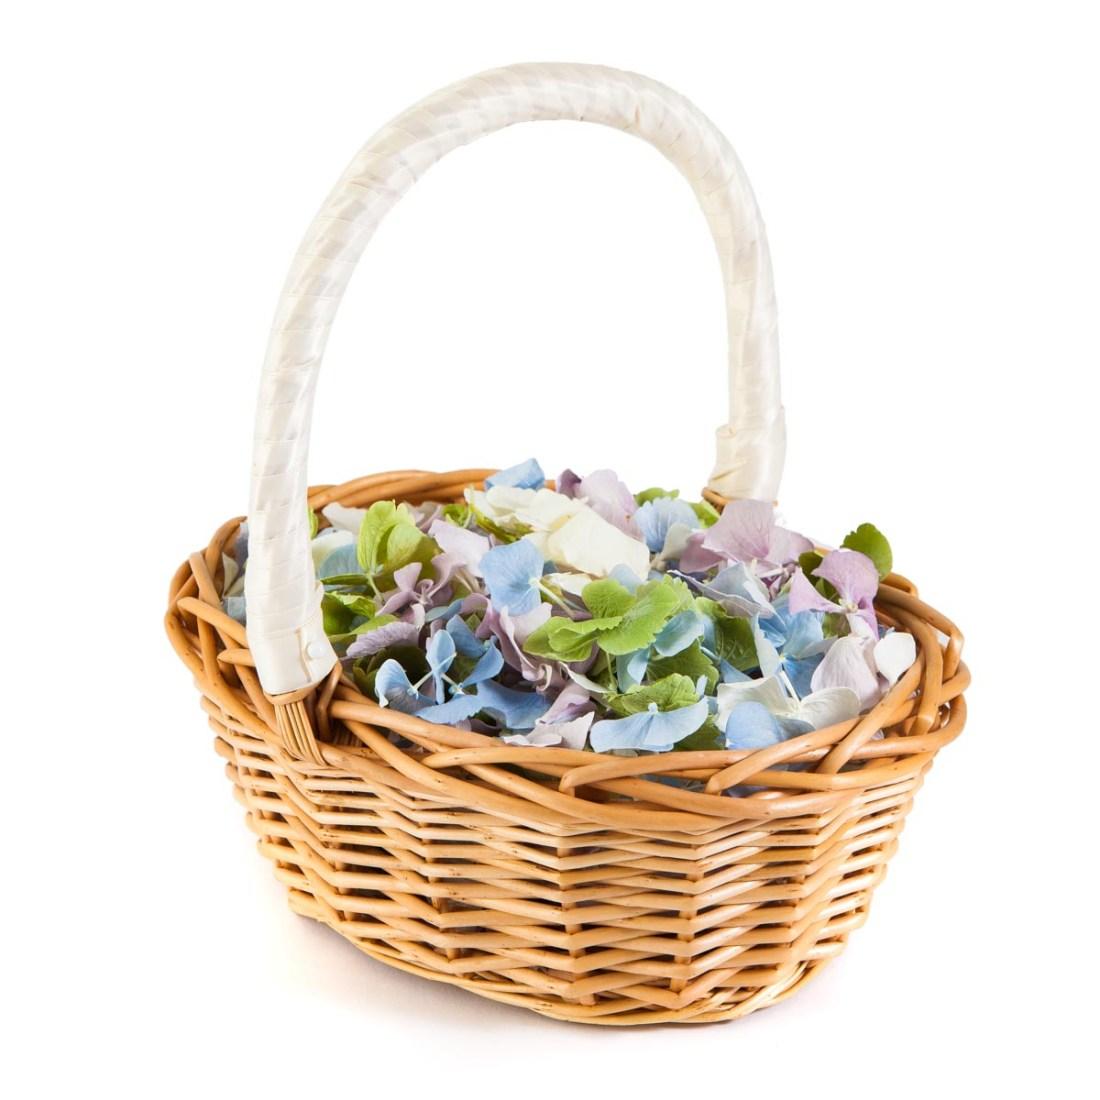 https://i1.wp.com/www.confettidirect.co.uk/wp-content/uploads/2018/12/flower-girl-baskets-real-flower-petal-confetti-hydrangea-petals.jpg?resize=1100%2C1100&ssl=1